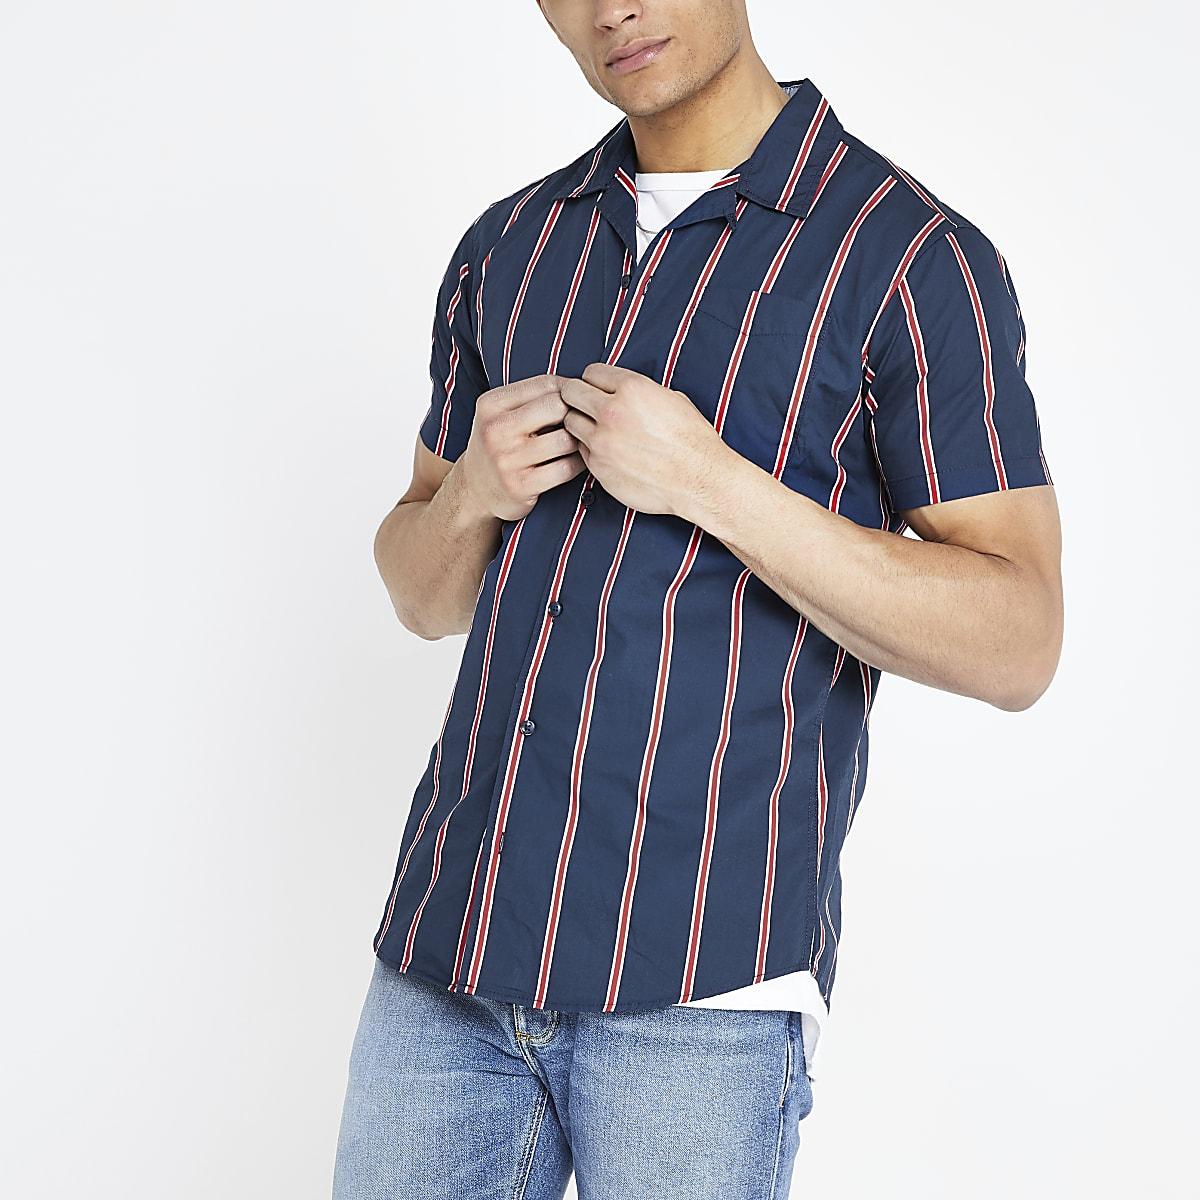 Jack and Jones navy stripe short sleeve shirt